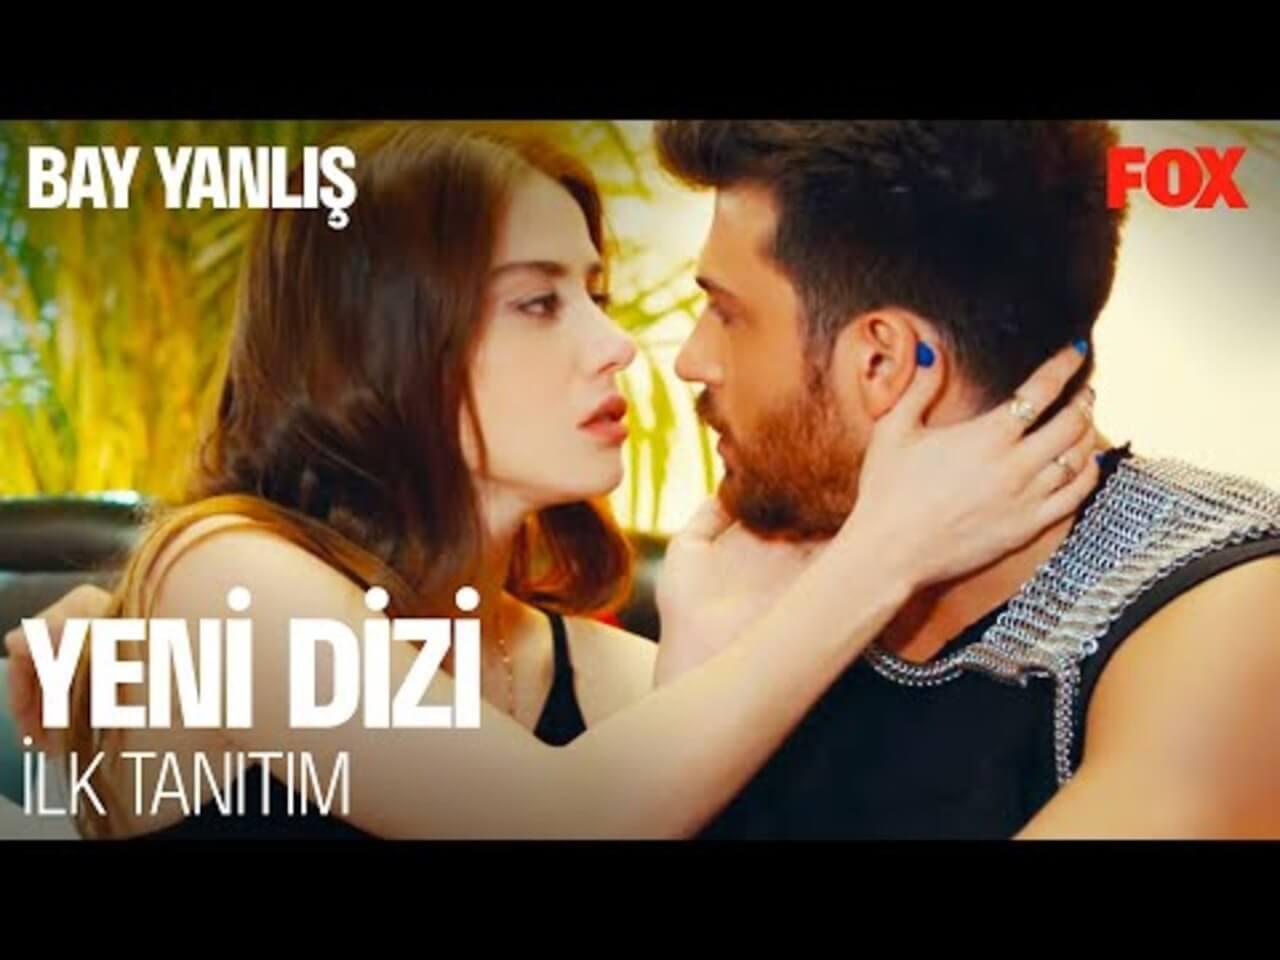 Mr. Wrong (Bay Yanlış) is a summer romantic-comedy of Turkish broadcaster Fox TV. (Image Credit-haberlerozel)